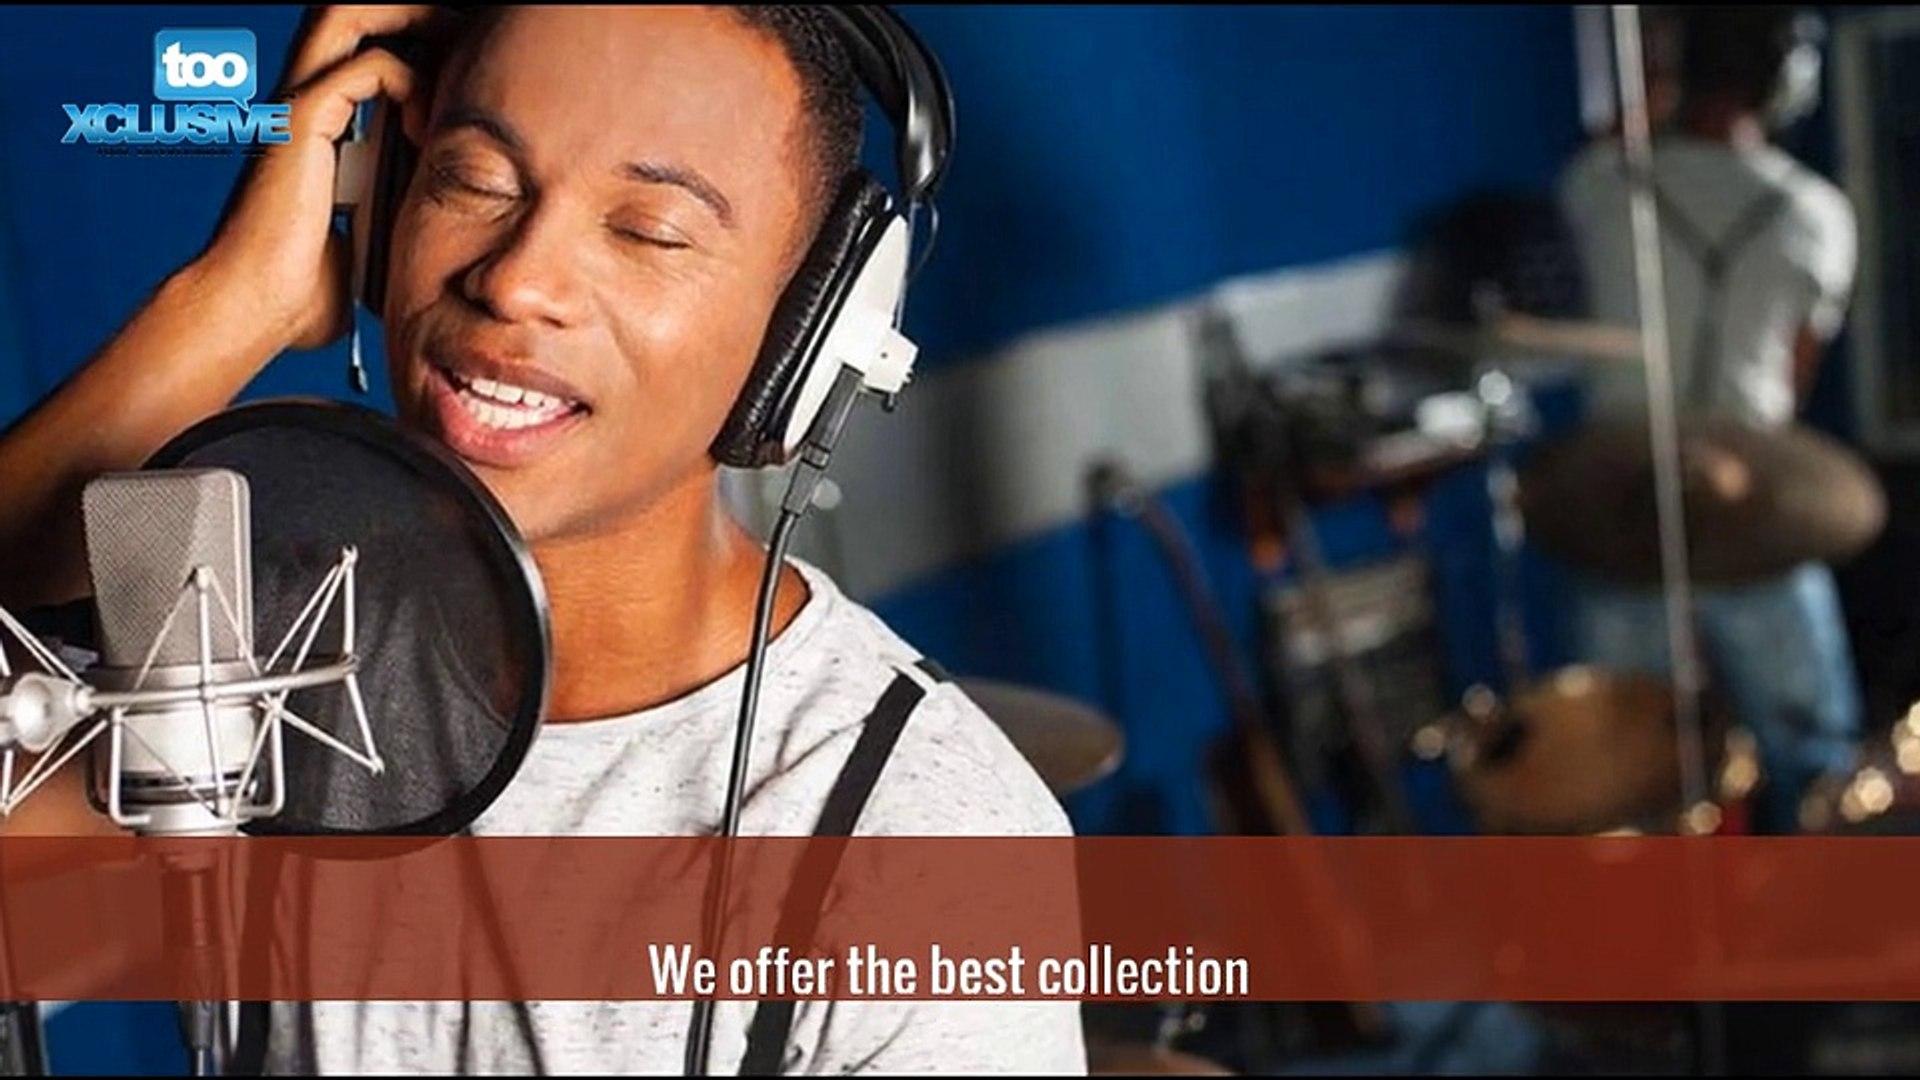 Latest Nigerian Music Videos and Naija Songs - TooXclusive